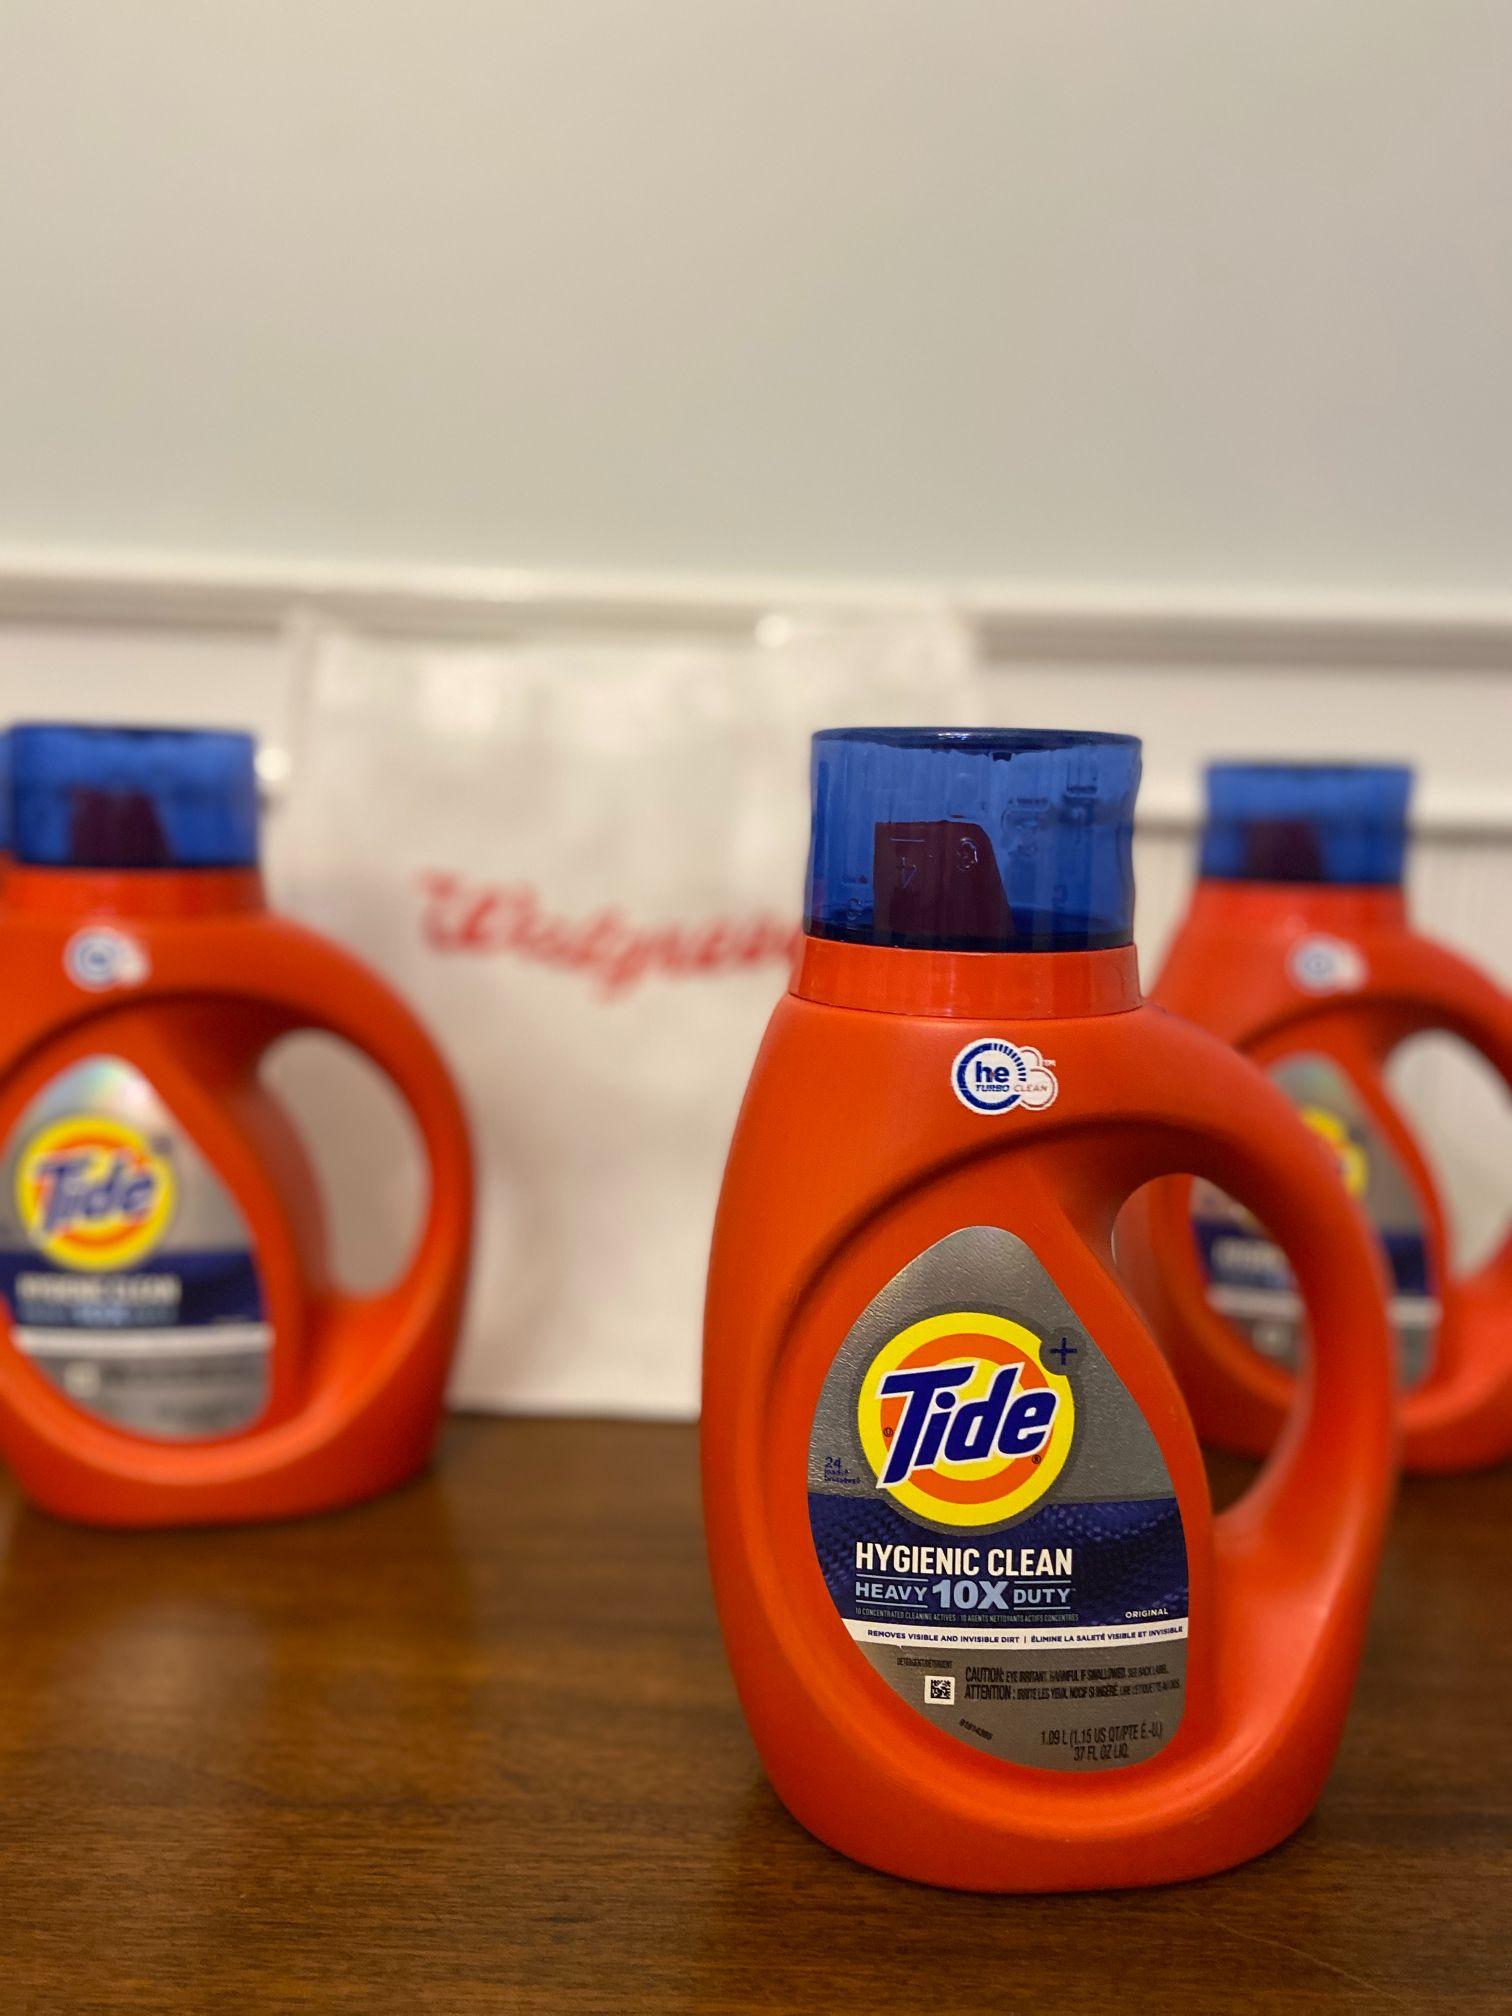 Tide Detergent for $2.99 at Walgreens!